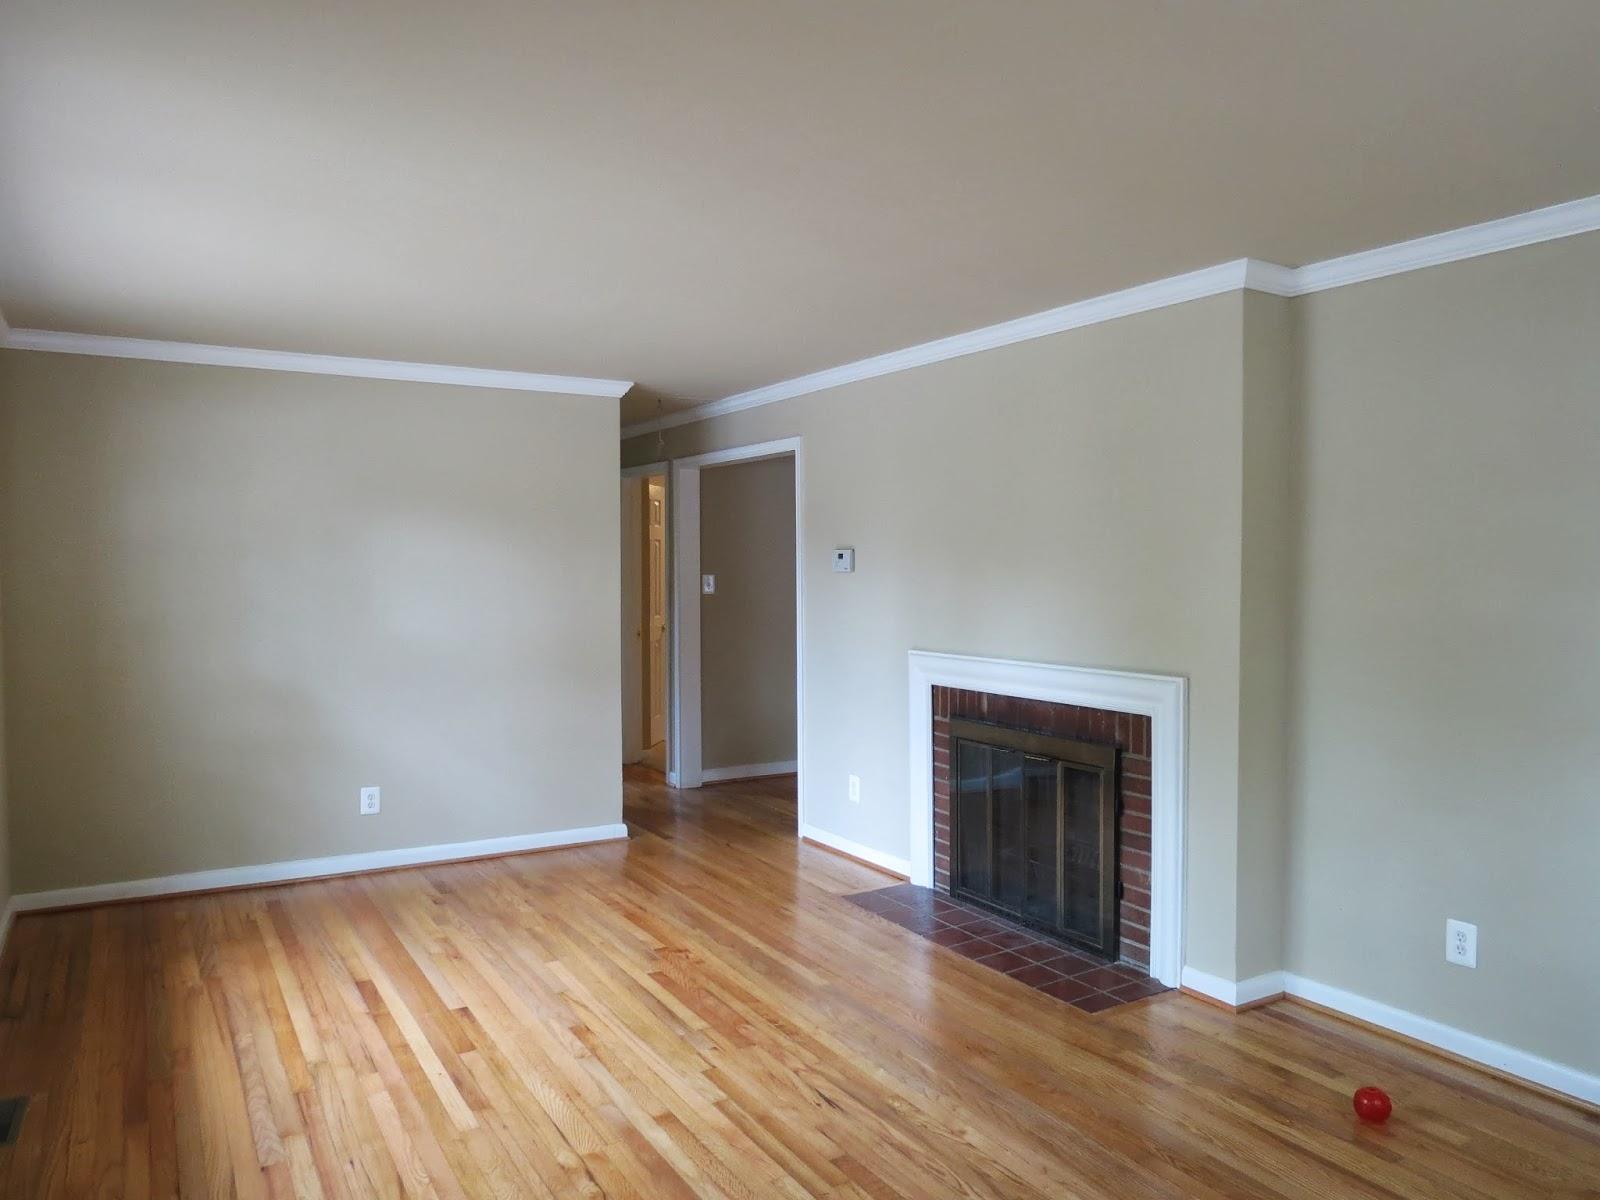 schil haus. Black Bedroom Furniture Sets. Home Design Ideas